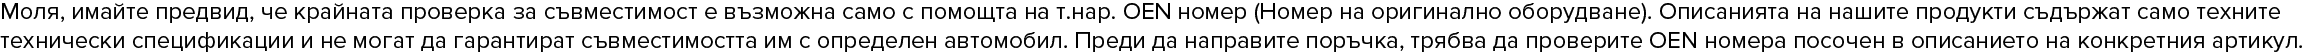 DENSO 60571785, A11-3707110CA, 4671057, 5269897, 5952 5G Запалителна свещ